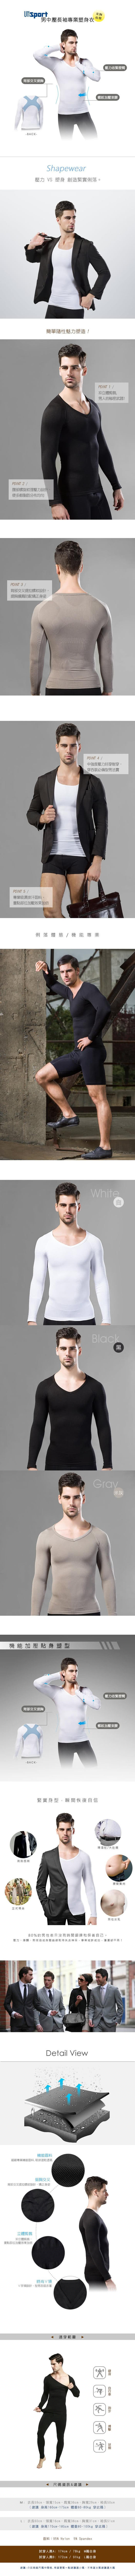 male_shapewear_medium_long_1119.jpg?t=1447926914862